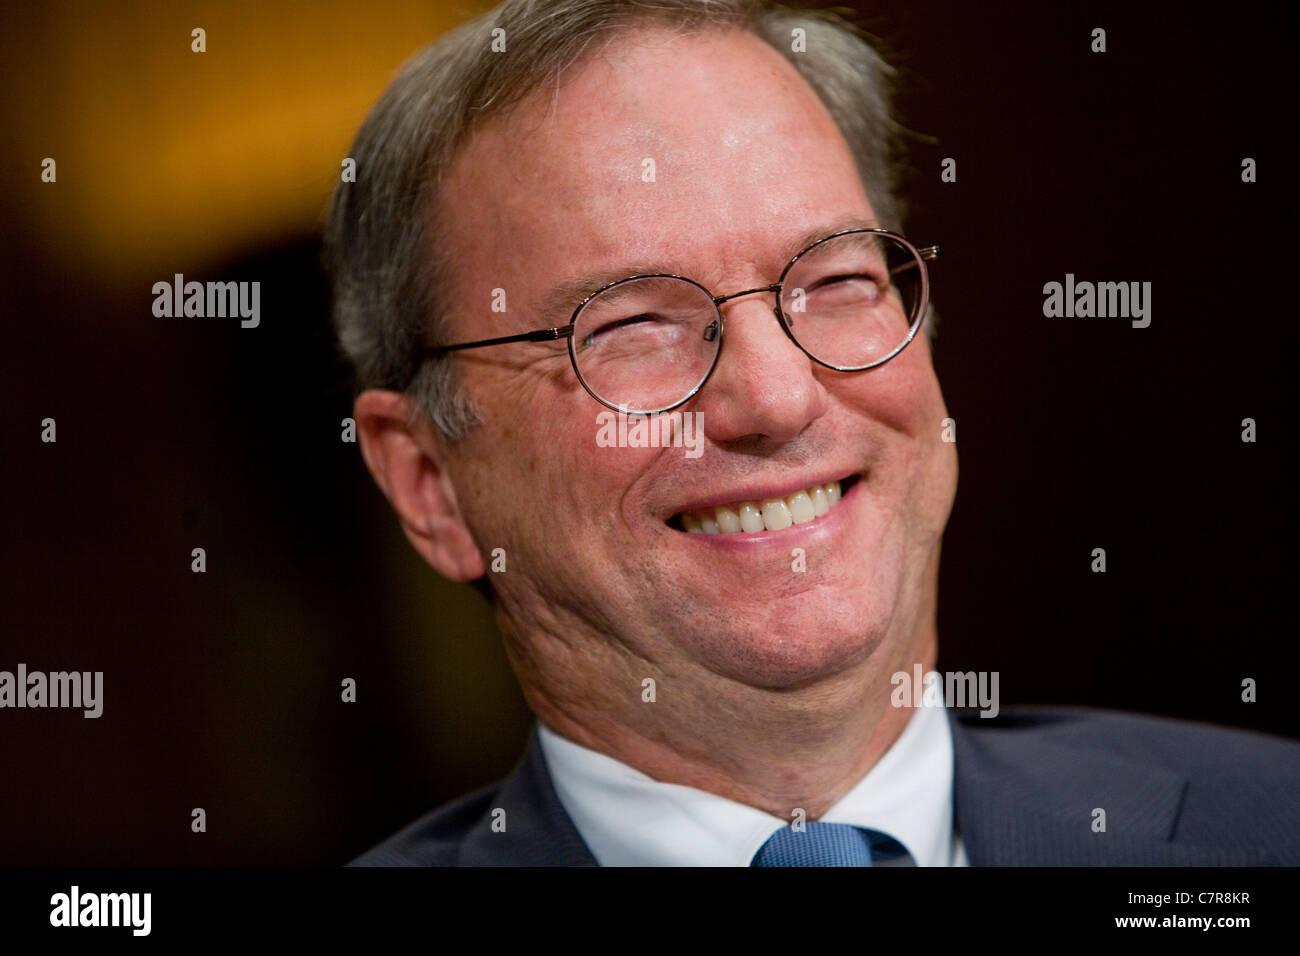 executive chairman vs big and tall hunting chairs schmidt stockfotos bilder alamy